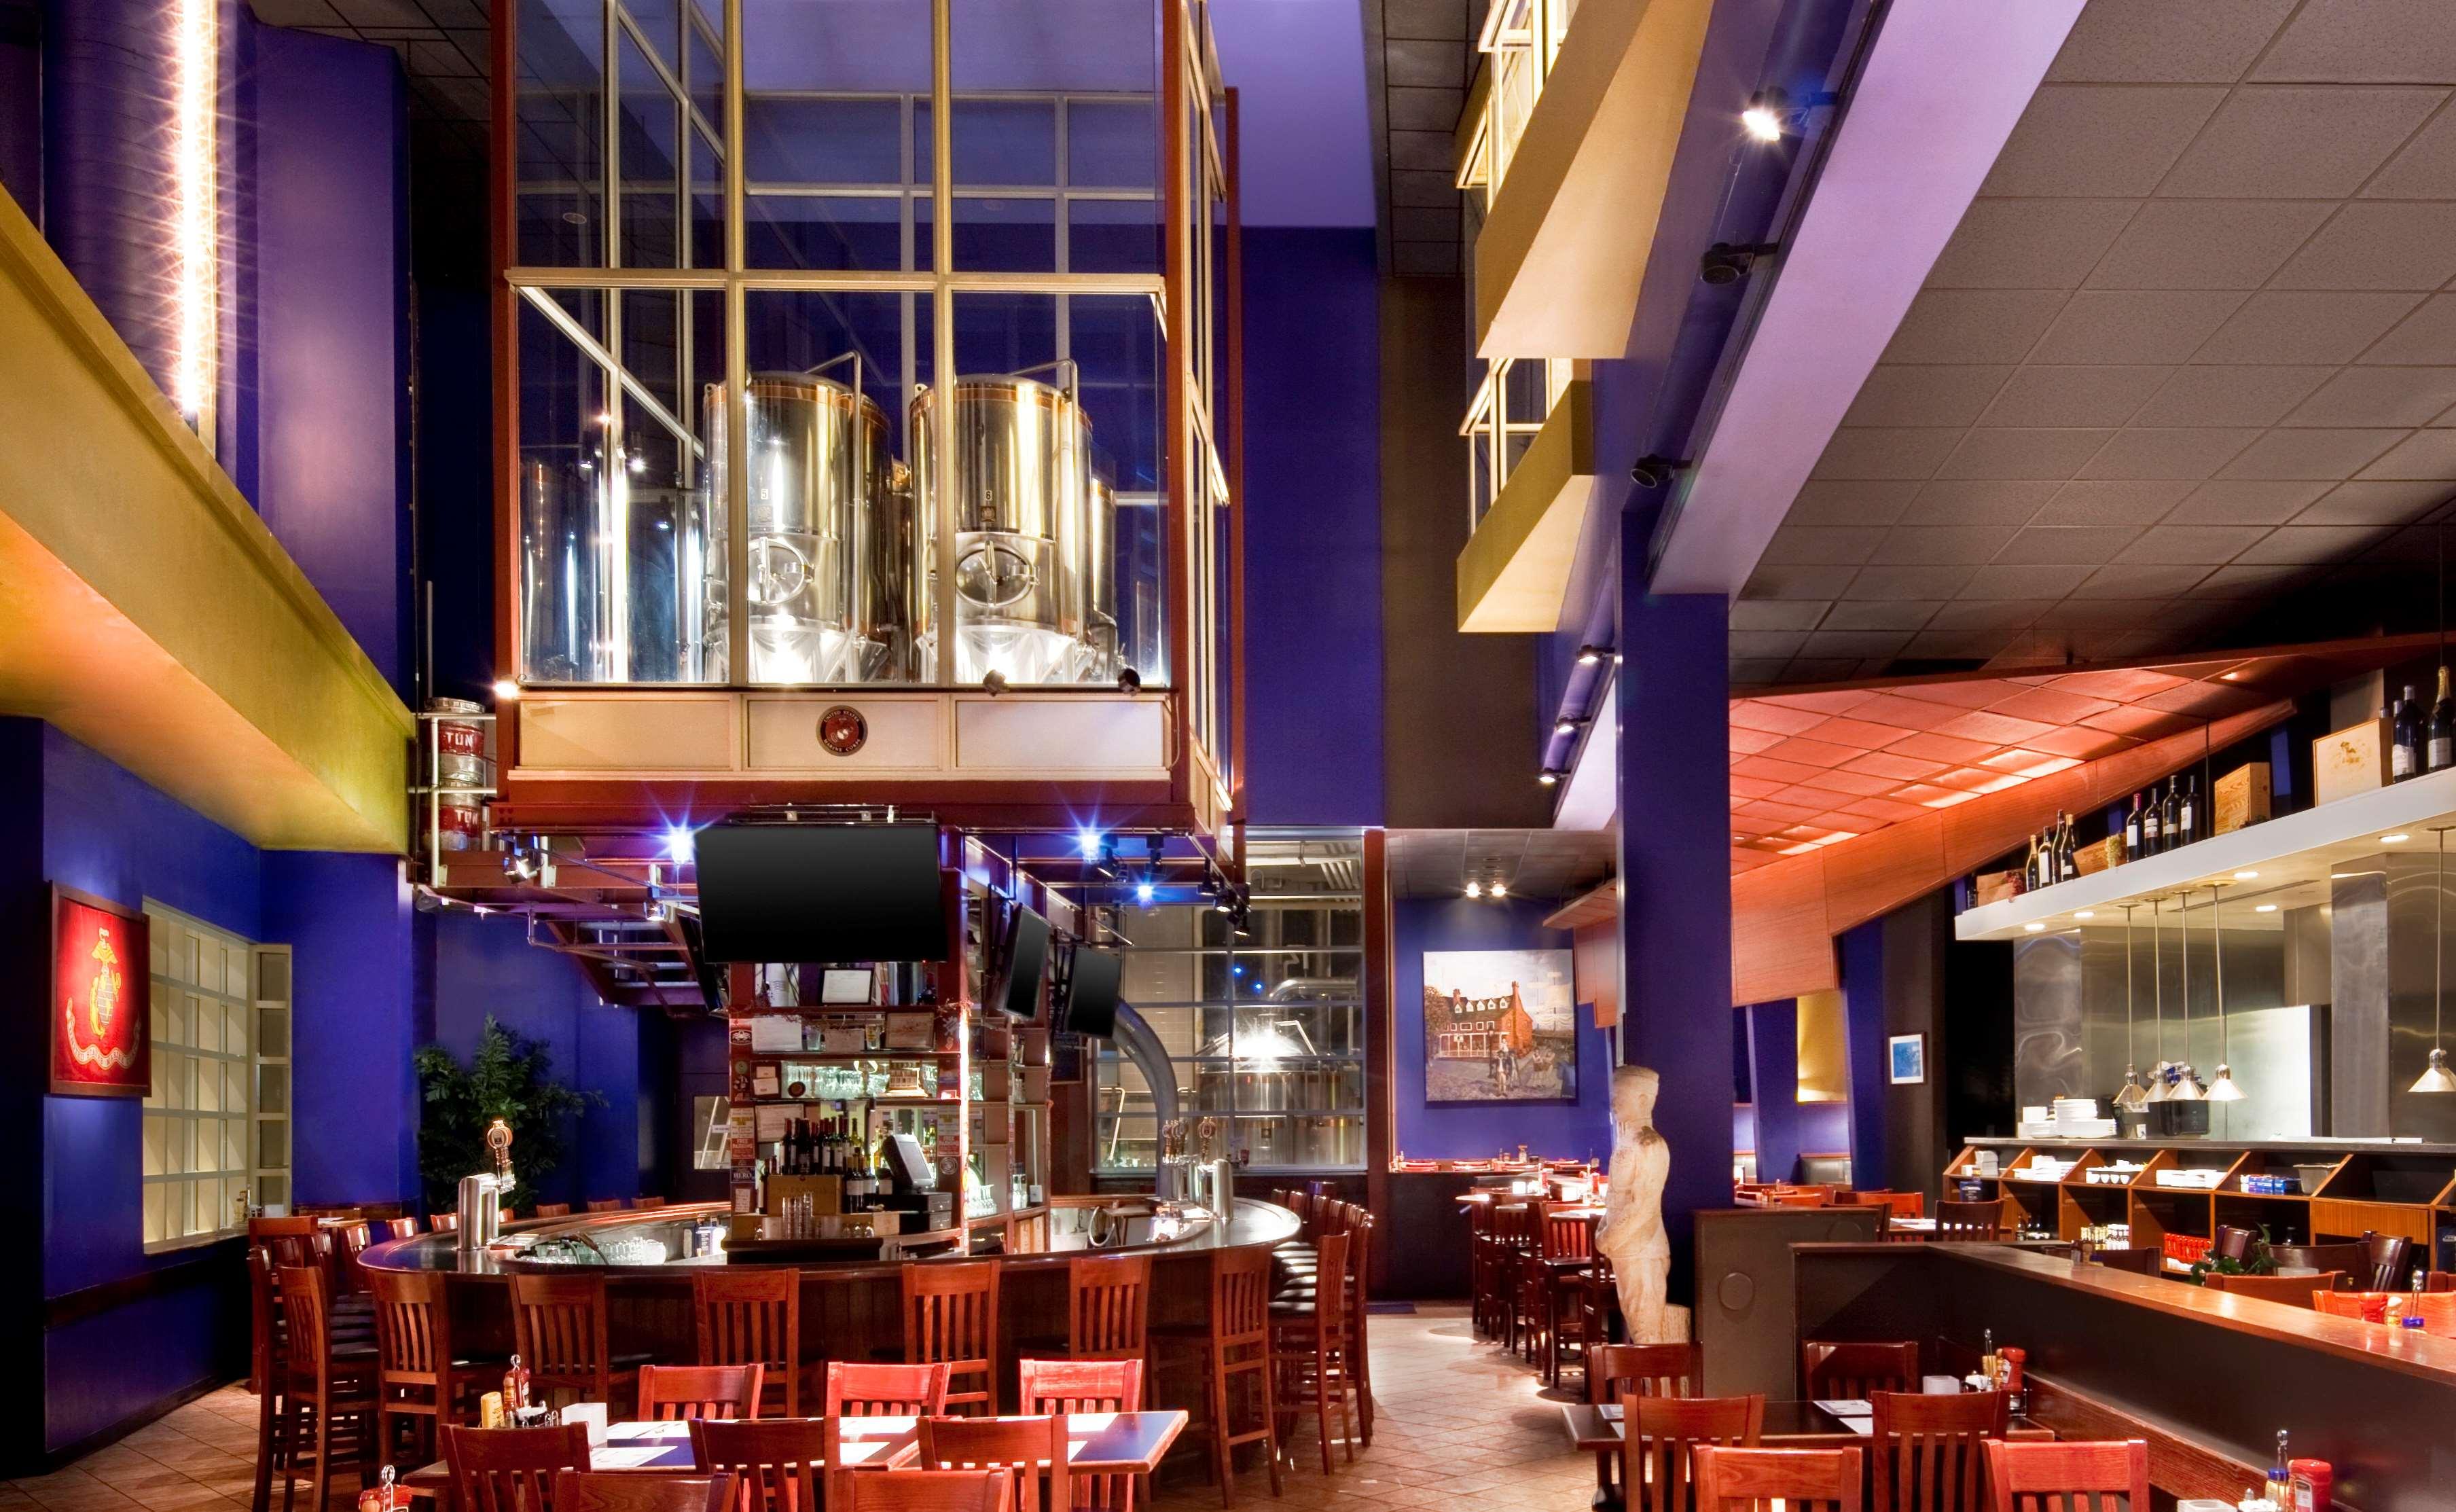 Sheraton Atlantic City Convention Center Hotel image 20